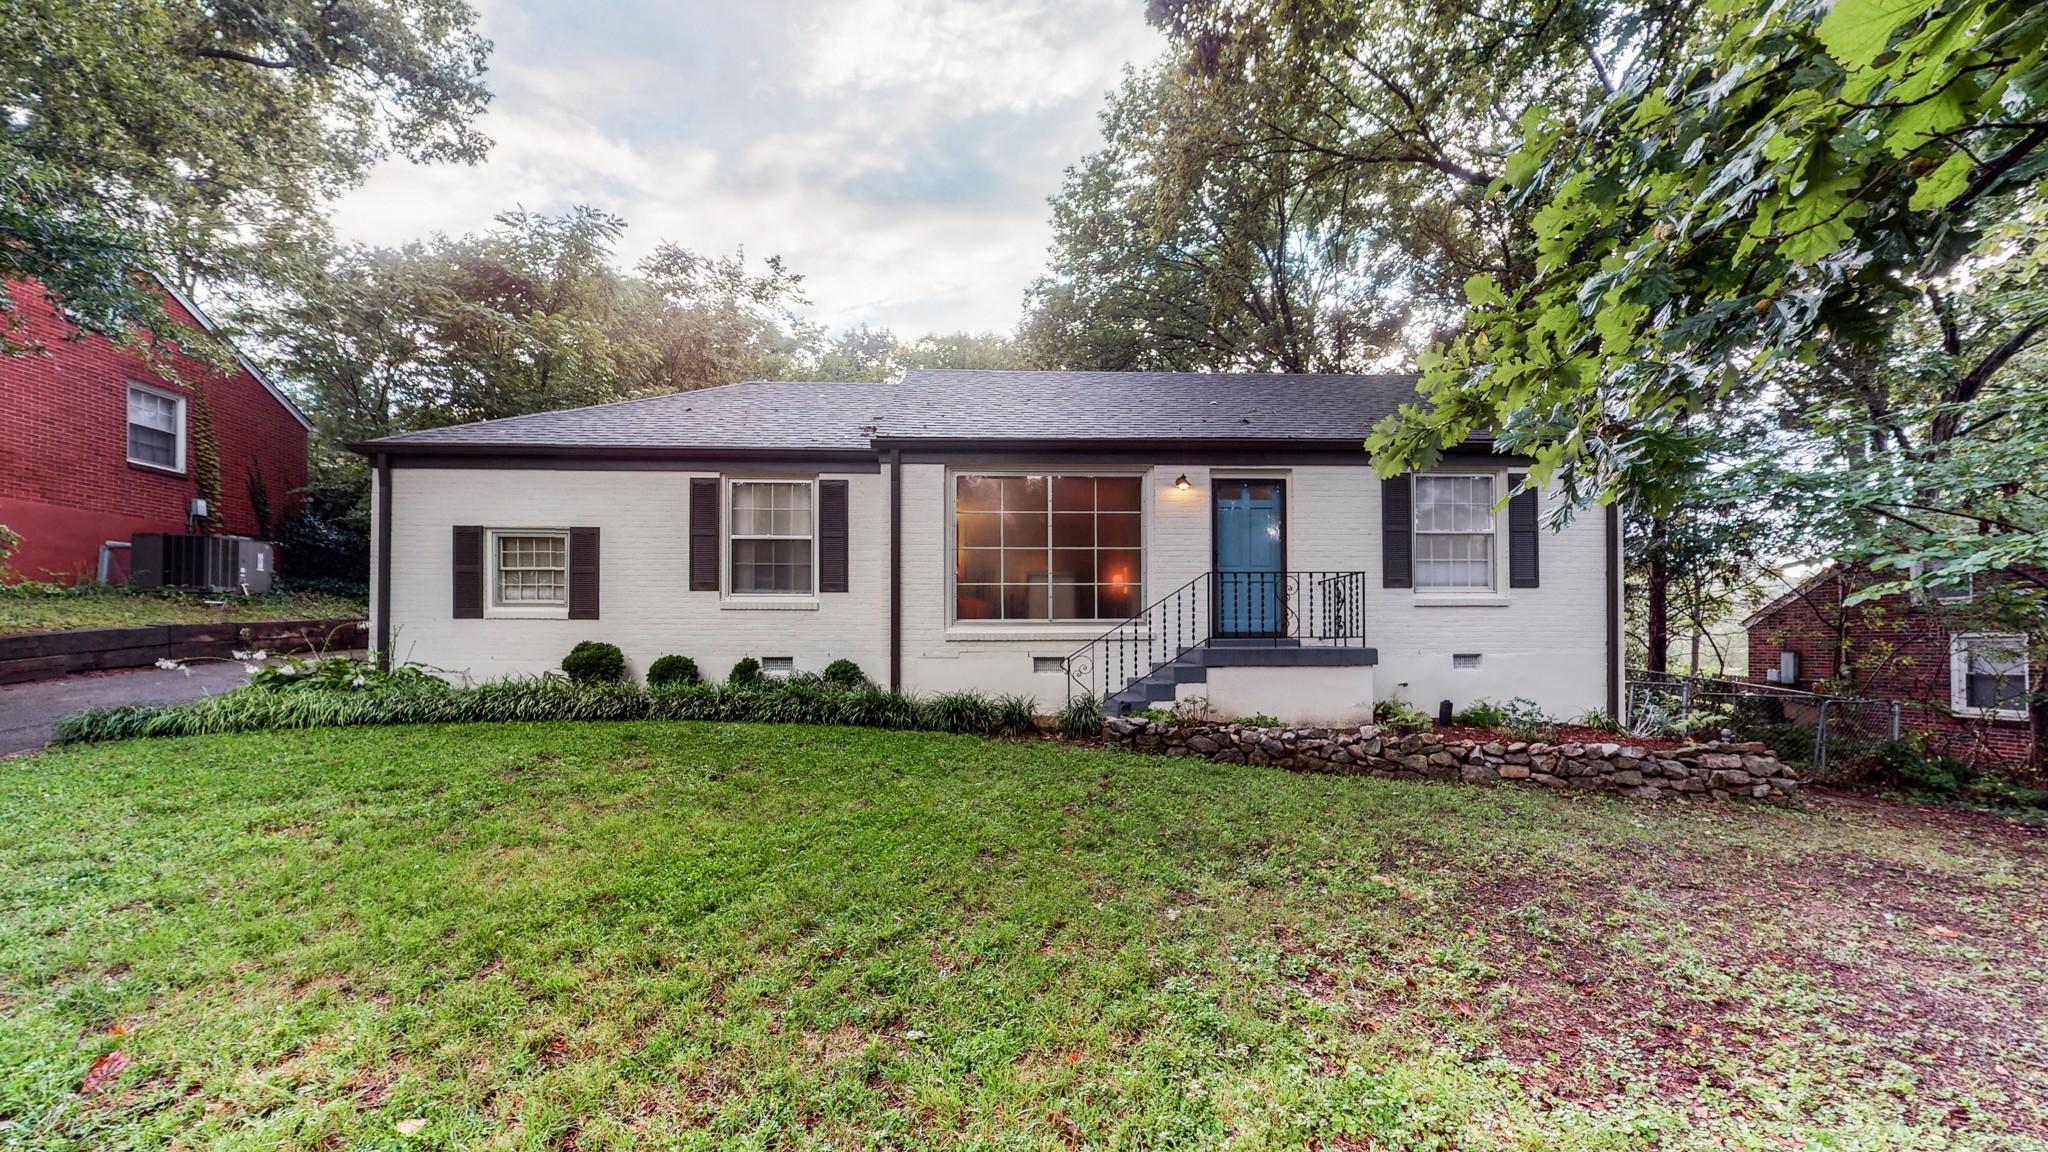 809 Neartop Dr Property Photo - Nashville, TN real estate listing